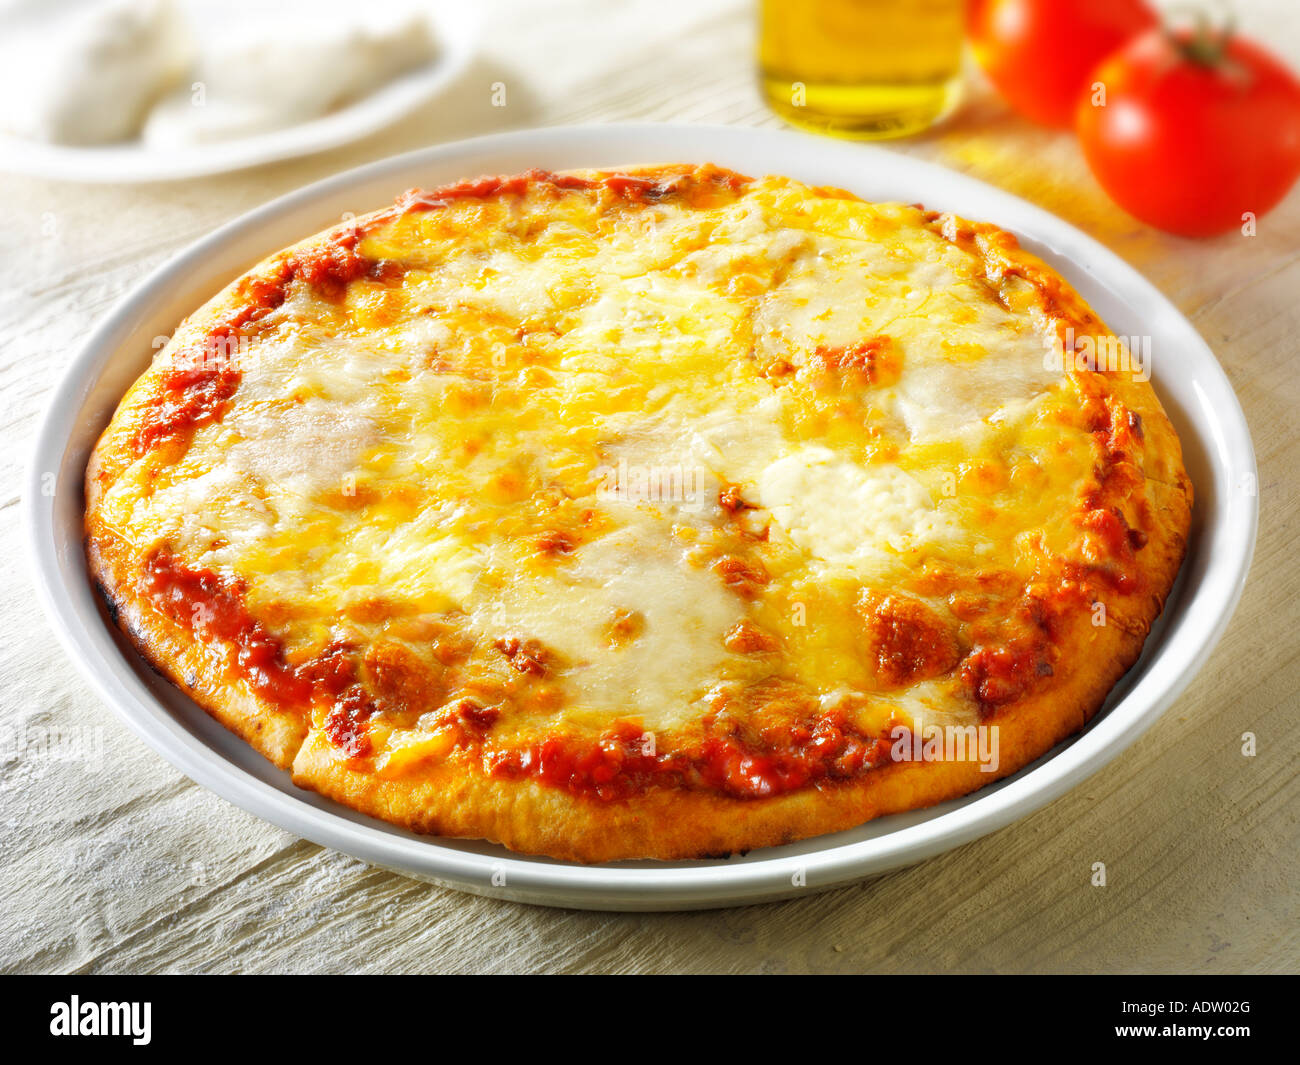 Pizza 3 quesos rematado con una pizza napolitana Margarita Foto de stock